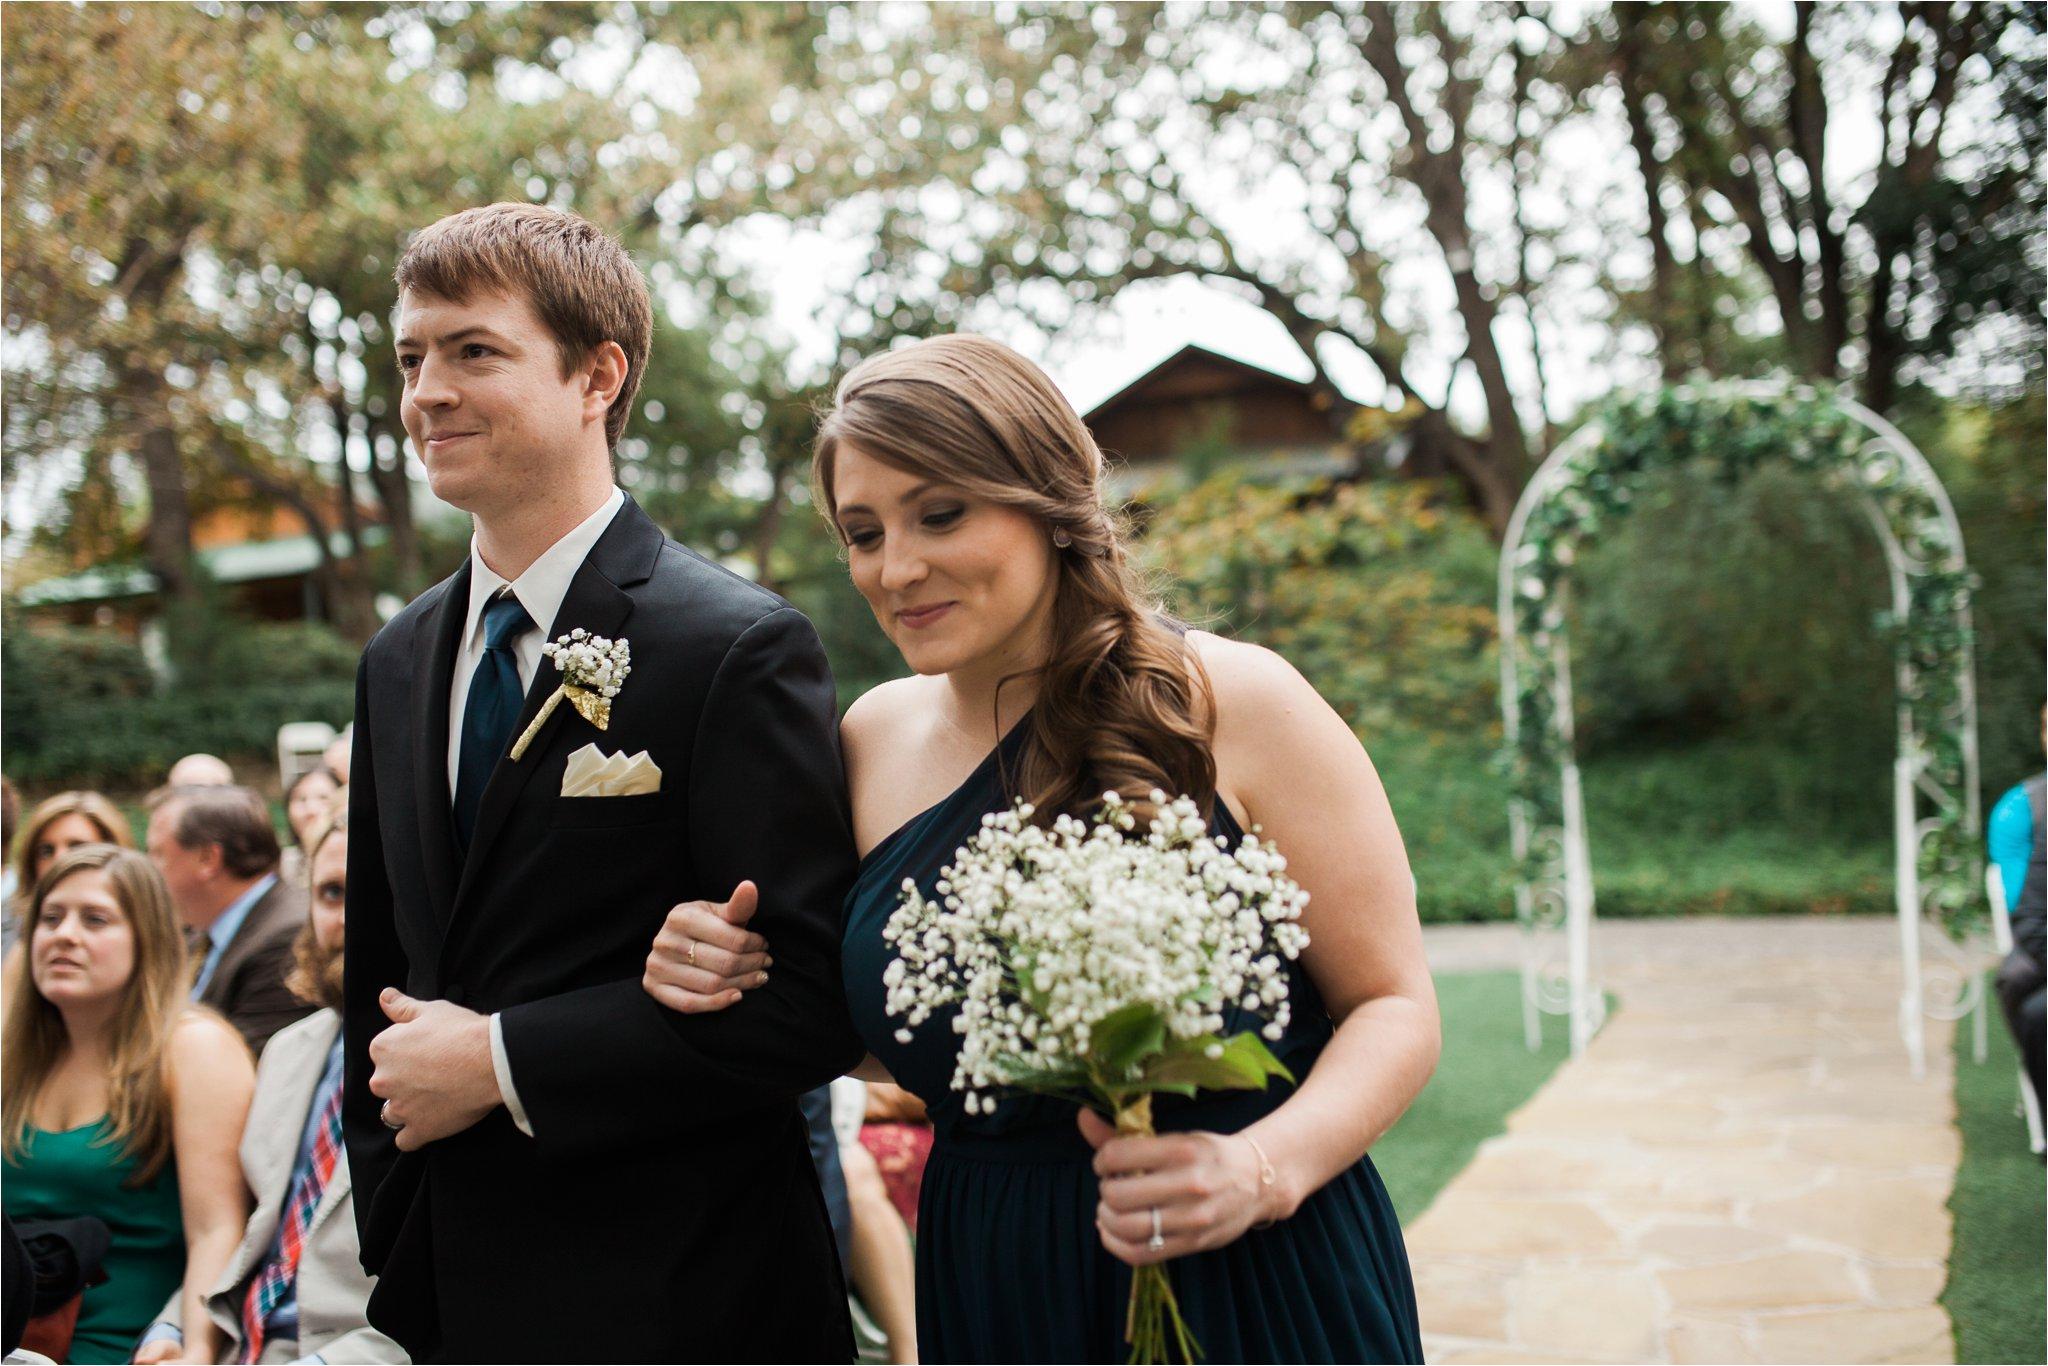 lunsford-wedding-486.jpg